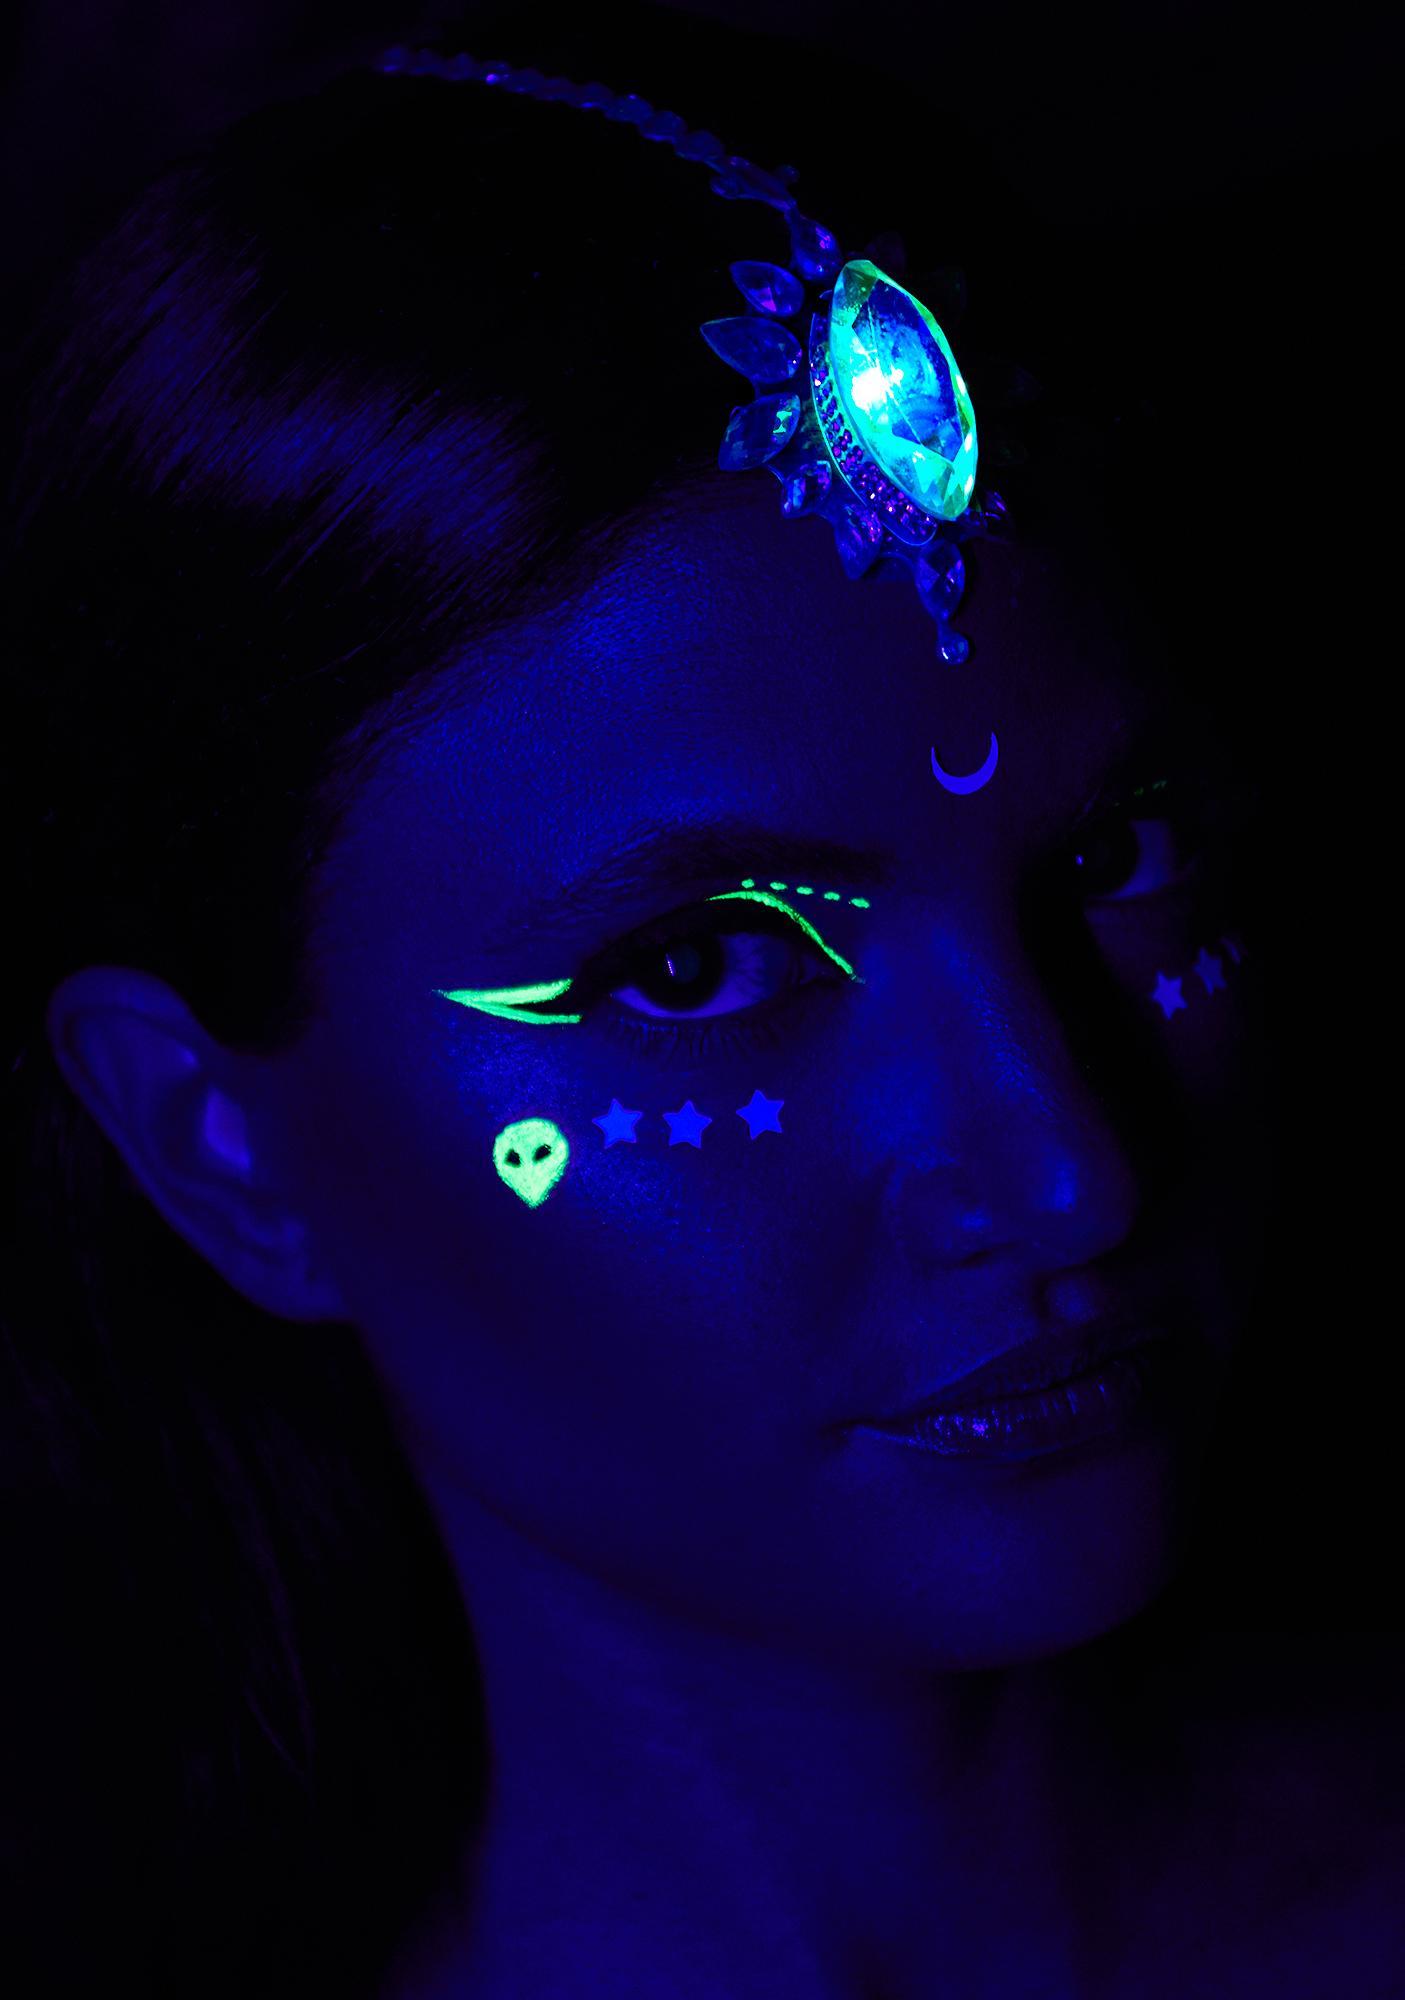 Festival Faces Group x Georgie Light Up Face Jewels